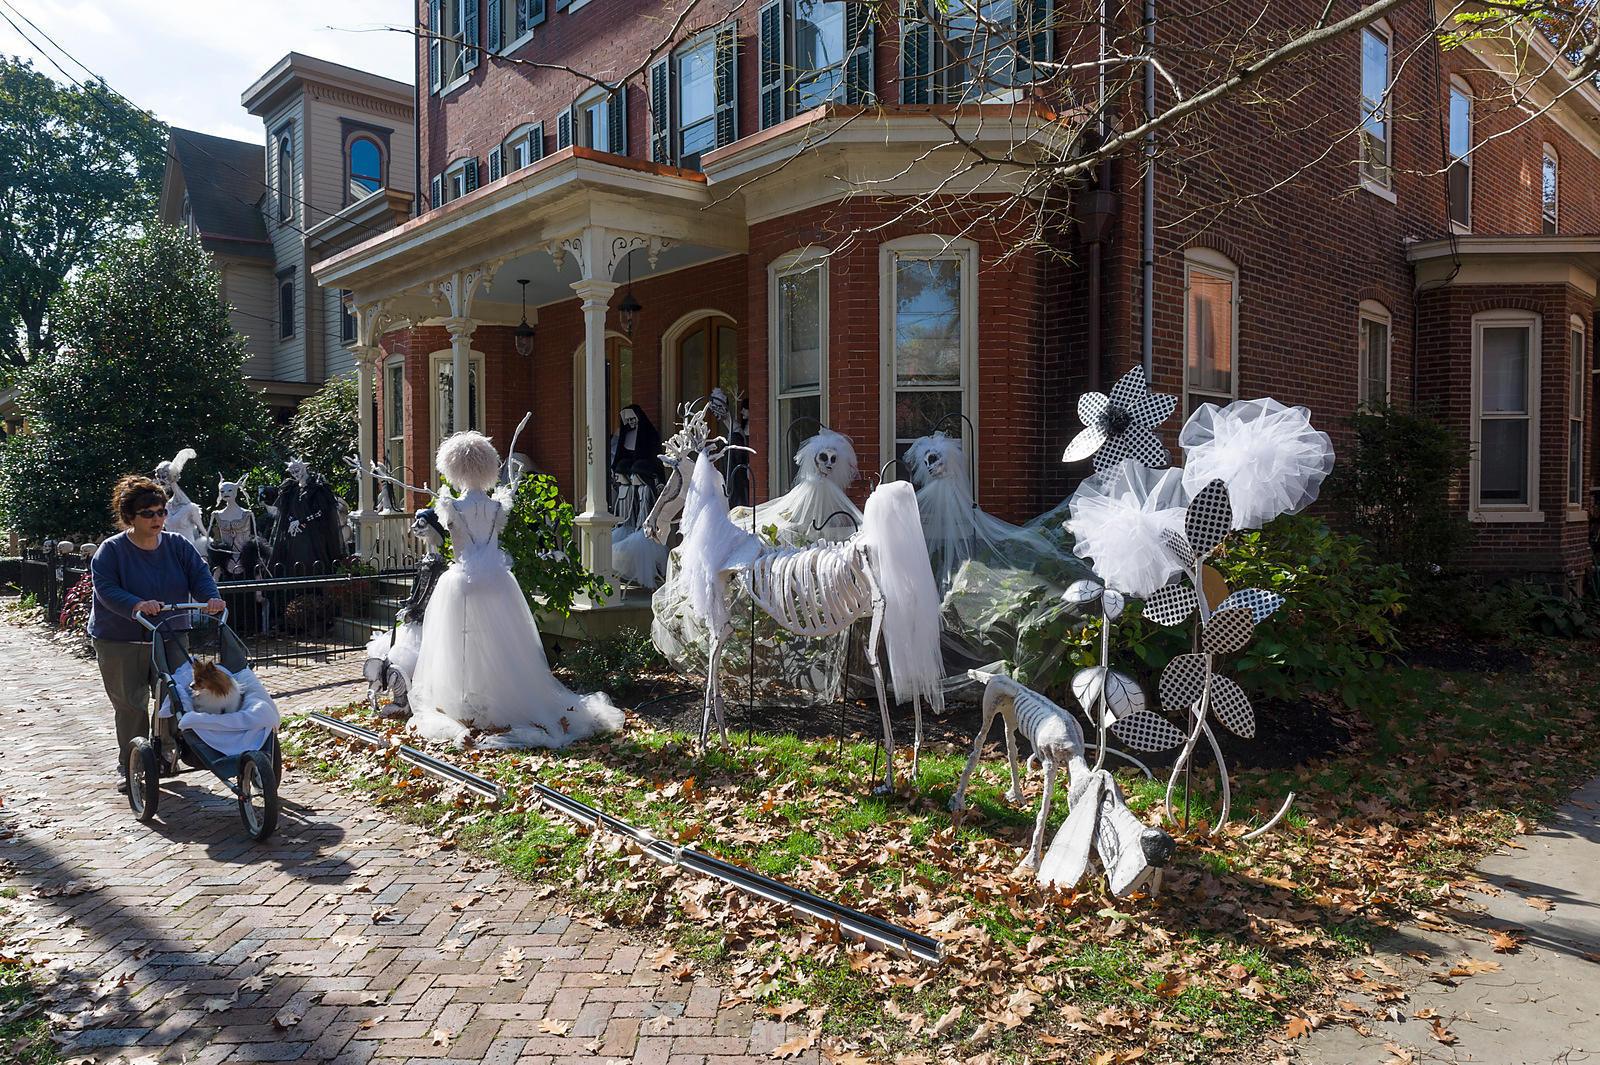 Outdoor Halloween Decorations On Sale  plete List of Halloween Decorations Ideas In Your Home